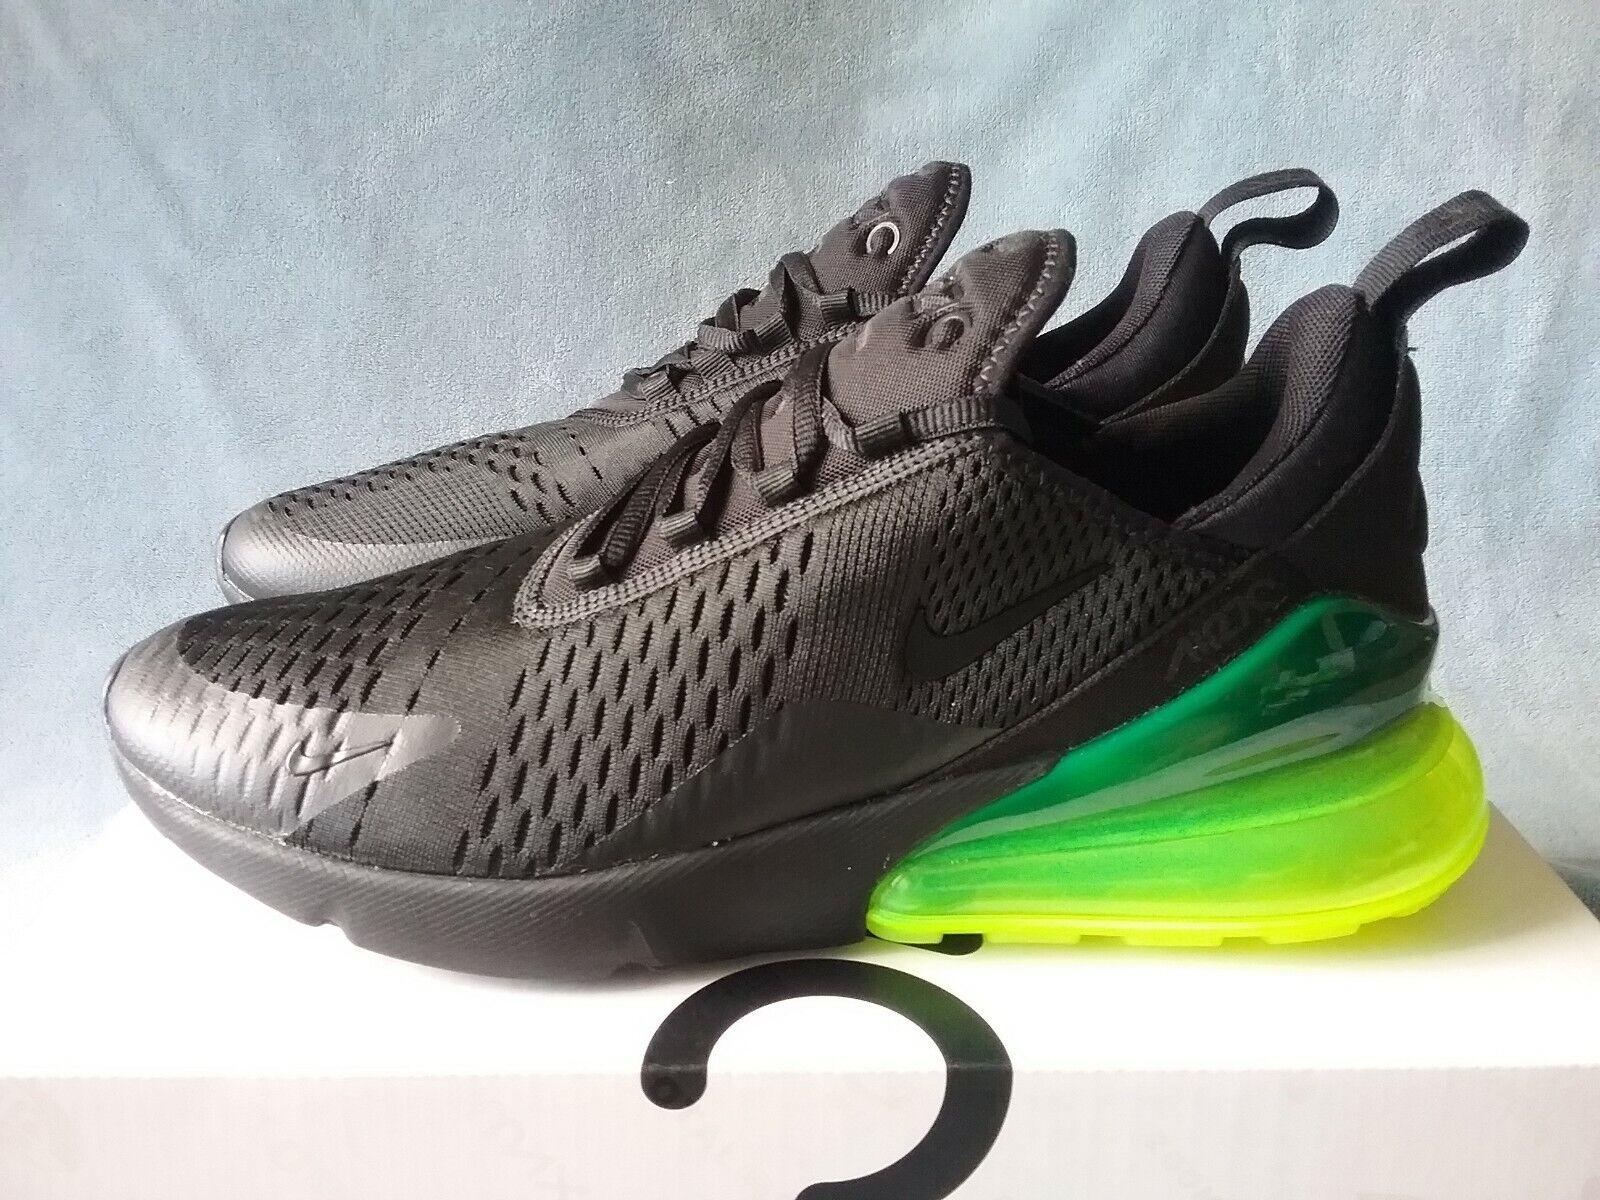 Nike Air 10 talla ah8050 011 amarillo fluorescente negro 270